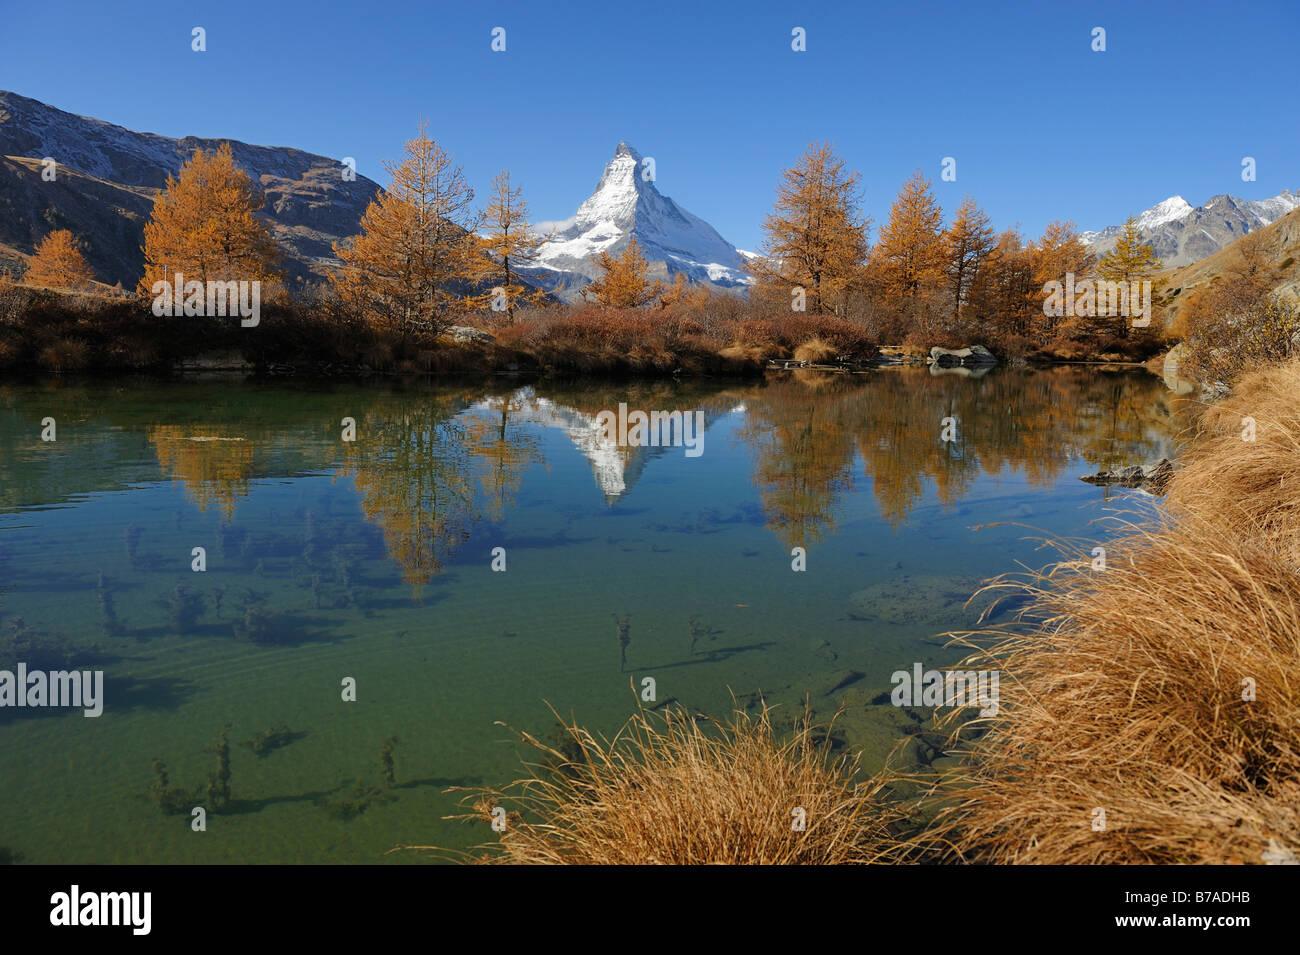 Grindjisee with view to the Matterhorn, Zermatt, Wallis, Switzerland, Europe - Stock Image